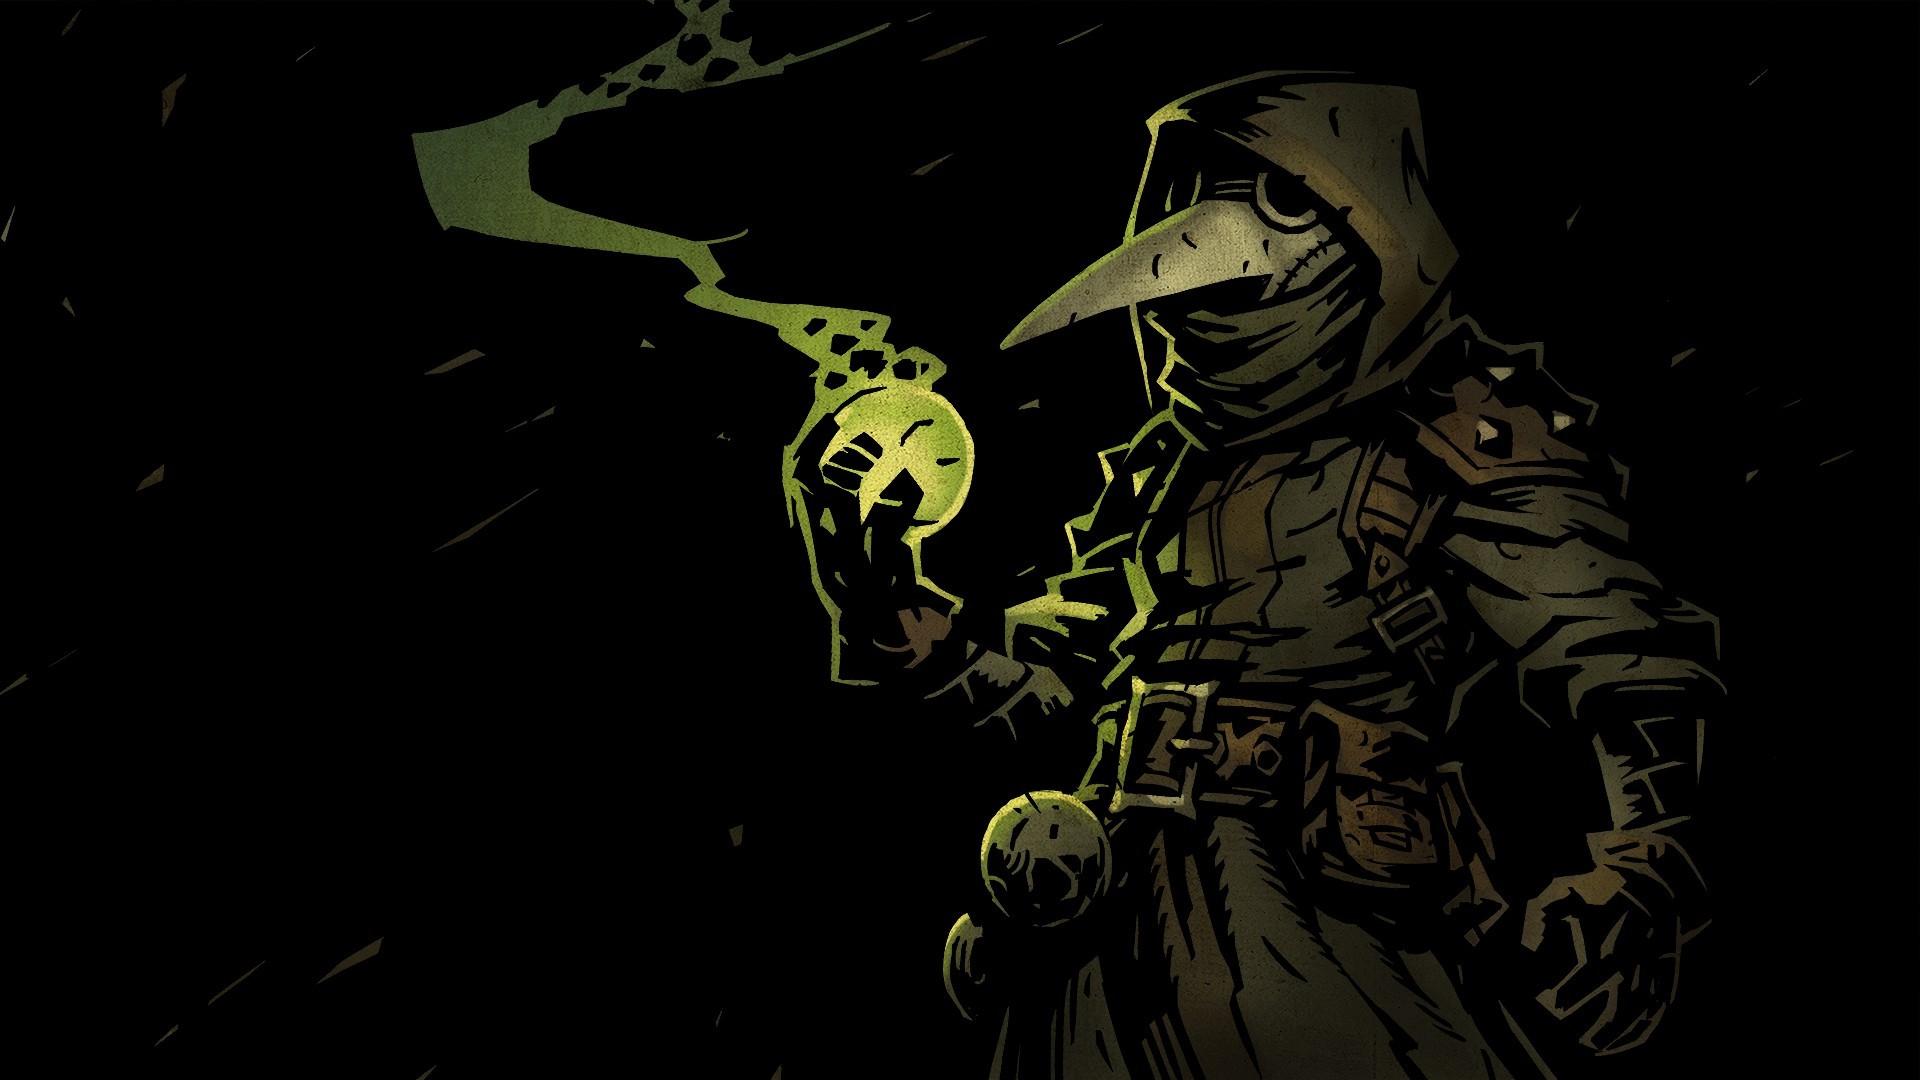 Darkest Dungeon Plague Video Games Wallpapers HD 1920x1080